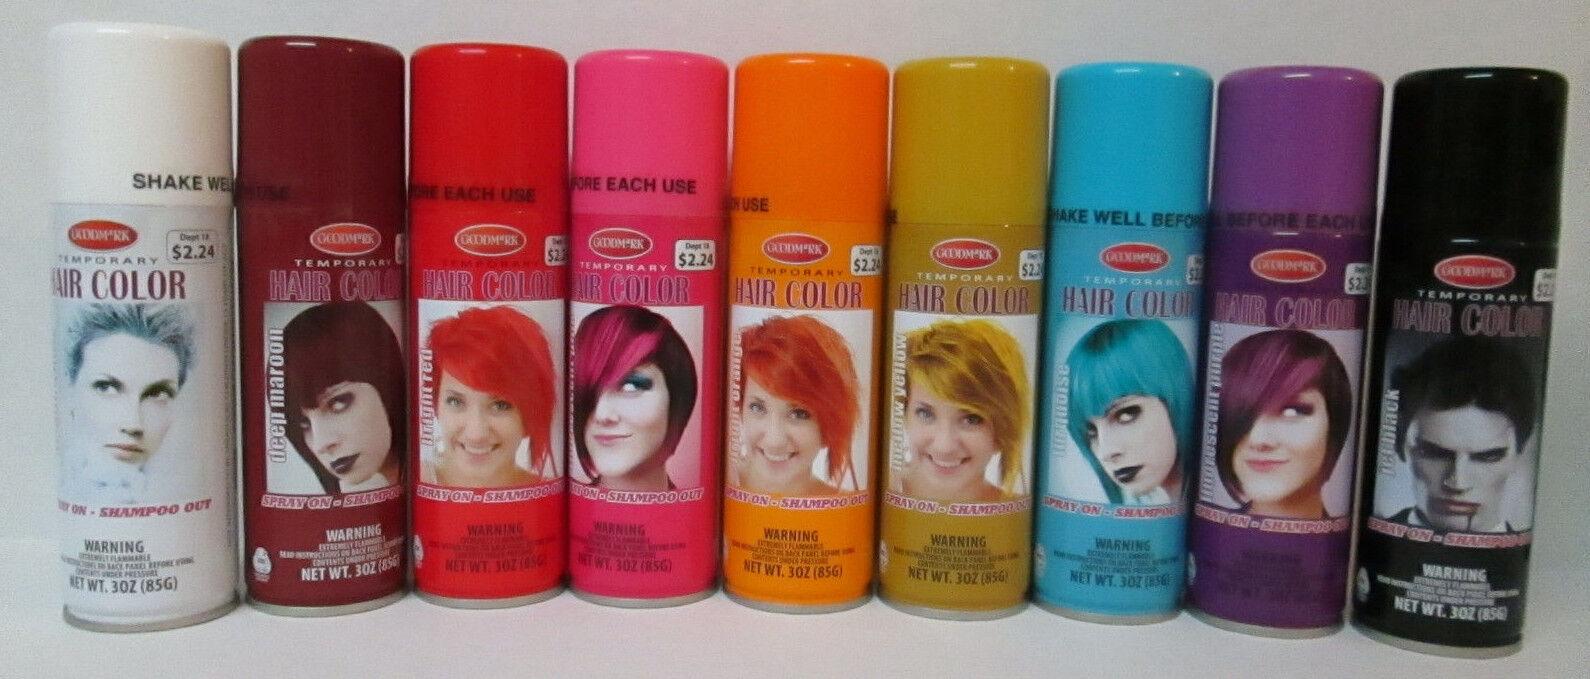 Goodmark Temporary Hair Color Grey Spray On Shampoo Out Party 3oz